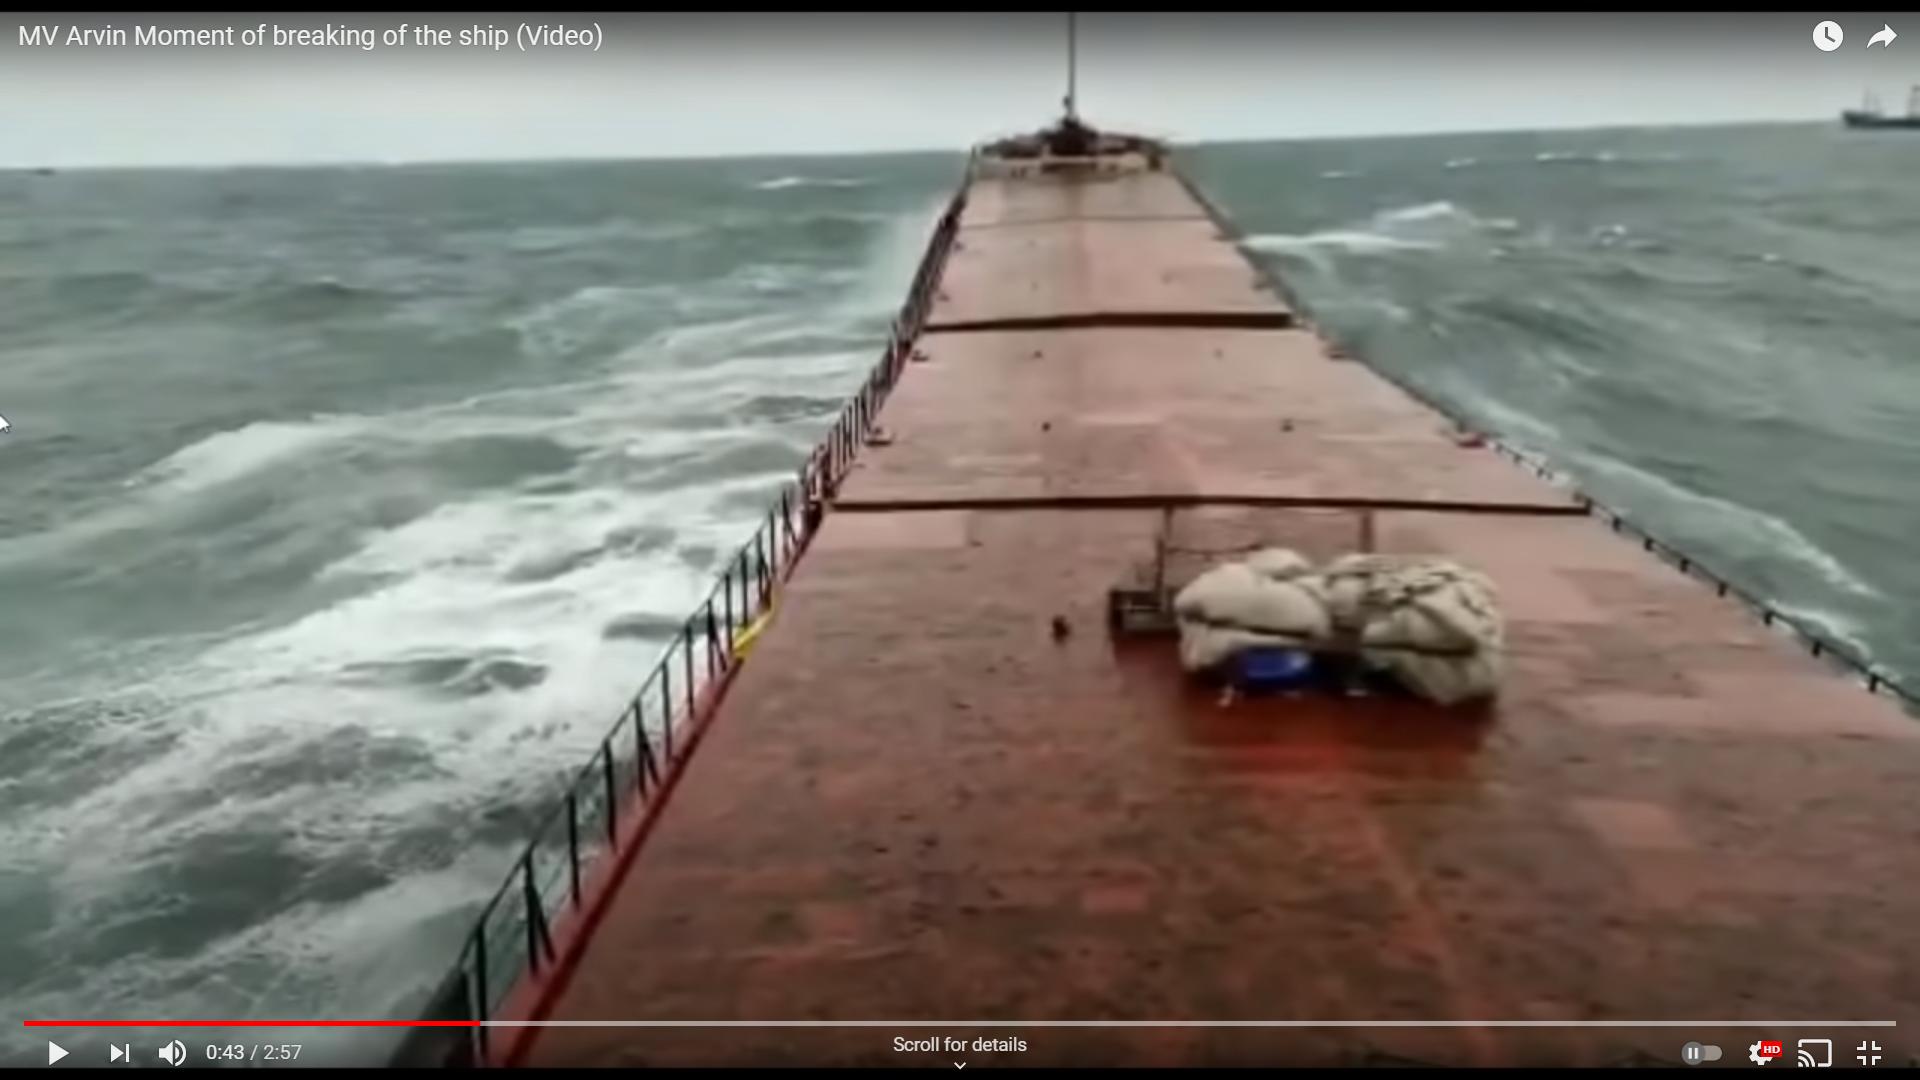 Palau-flagged cargo ship MV Arvin sinks off Turkey's Black Sea coast